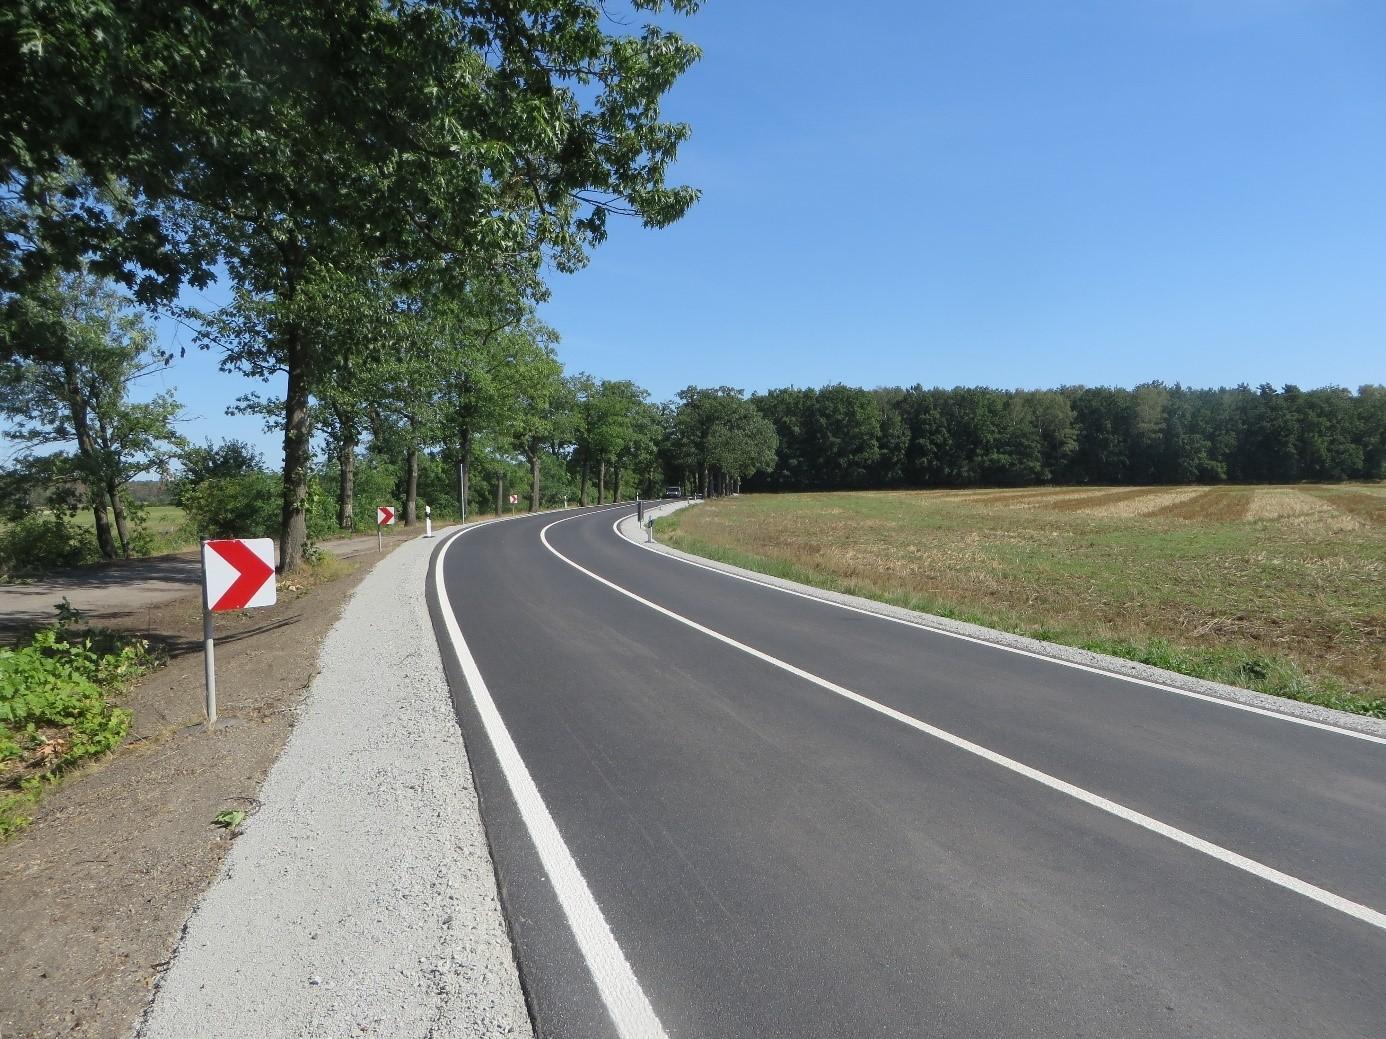 S 92 Richtung Bernsdorf, Kurve nach dem Bahnübergang